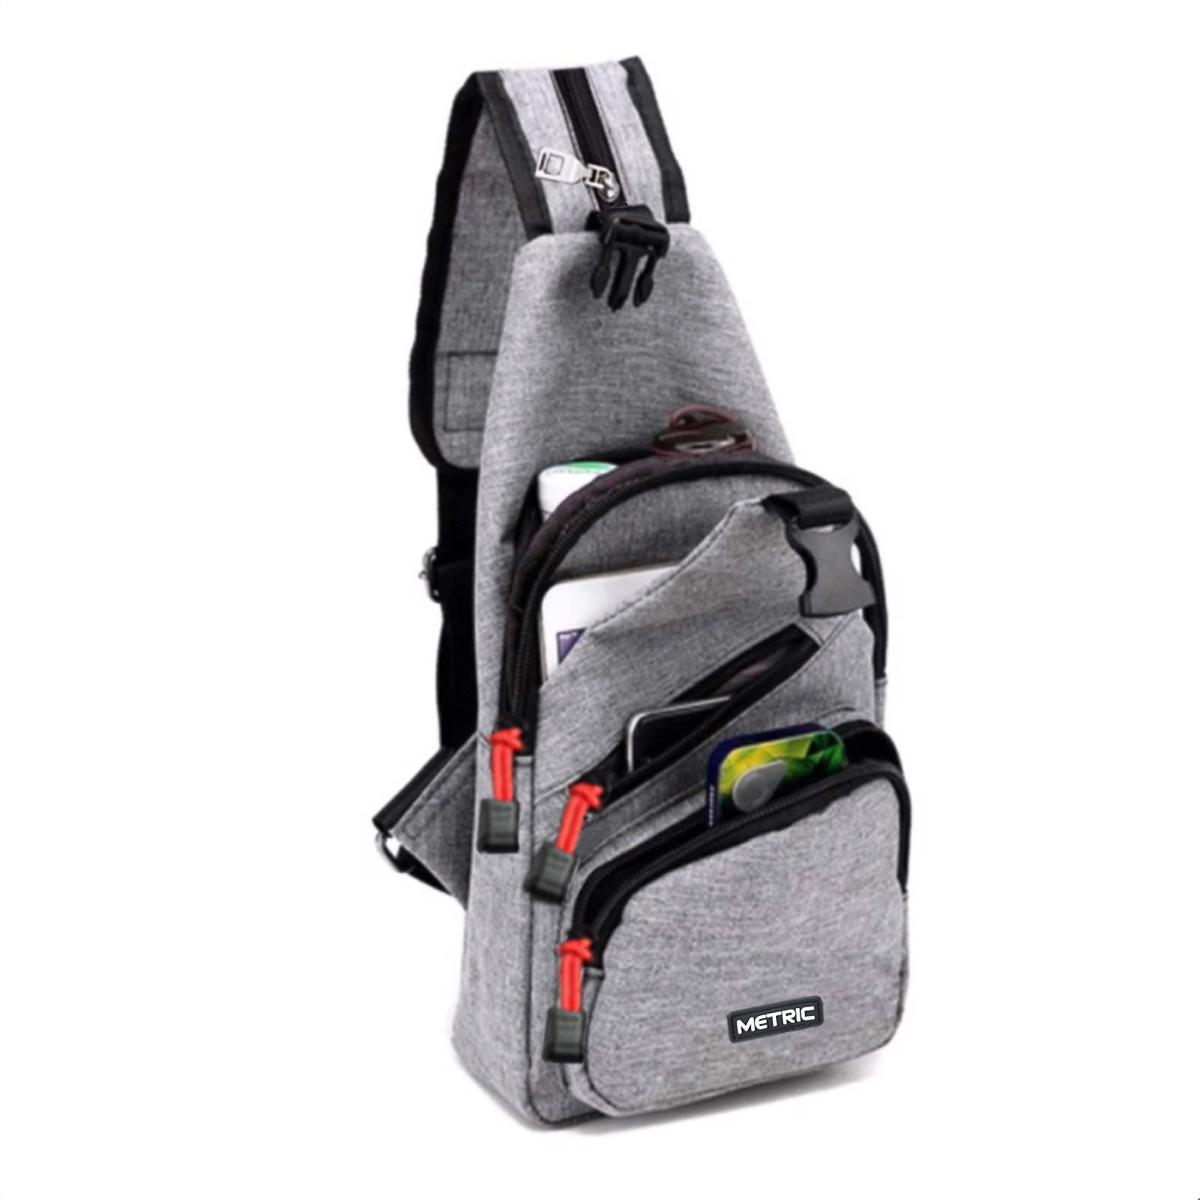 Metric Tas Sling Bag Tas Waistbag Tas Selempang Tas Ransel Tali Satu Tas Sling Bag Korea Kode Artikel Mi004 Size 10 Inchi Korean Design - Light Grey